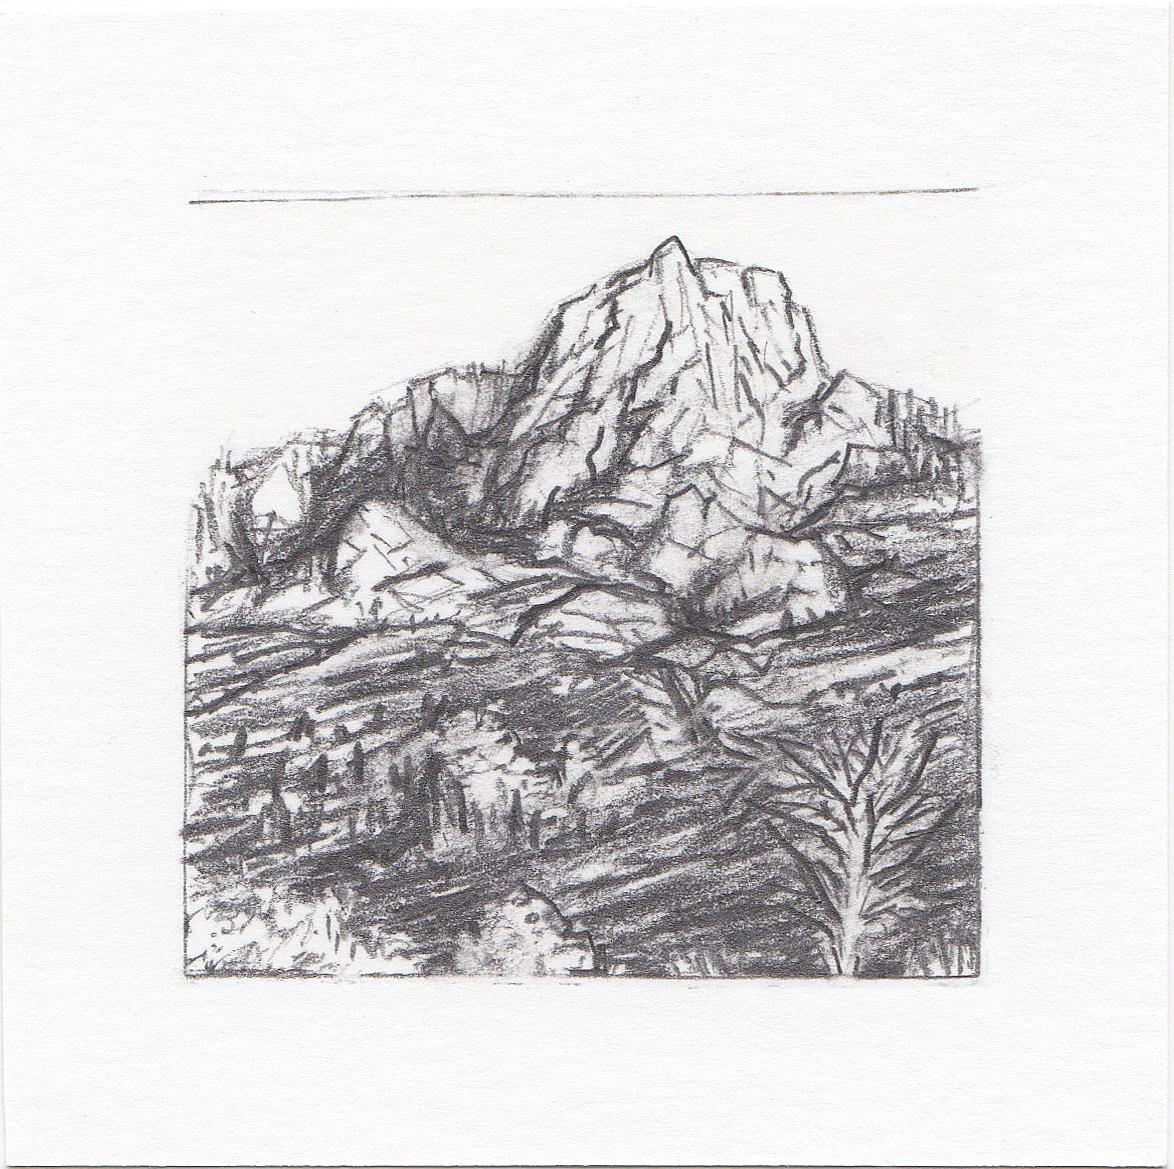 #13 Lone Peak Trail, Wasatch Mountains, Utah | 3x3 | graphite